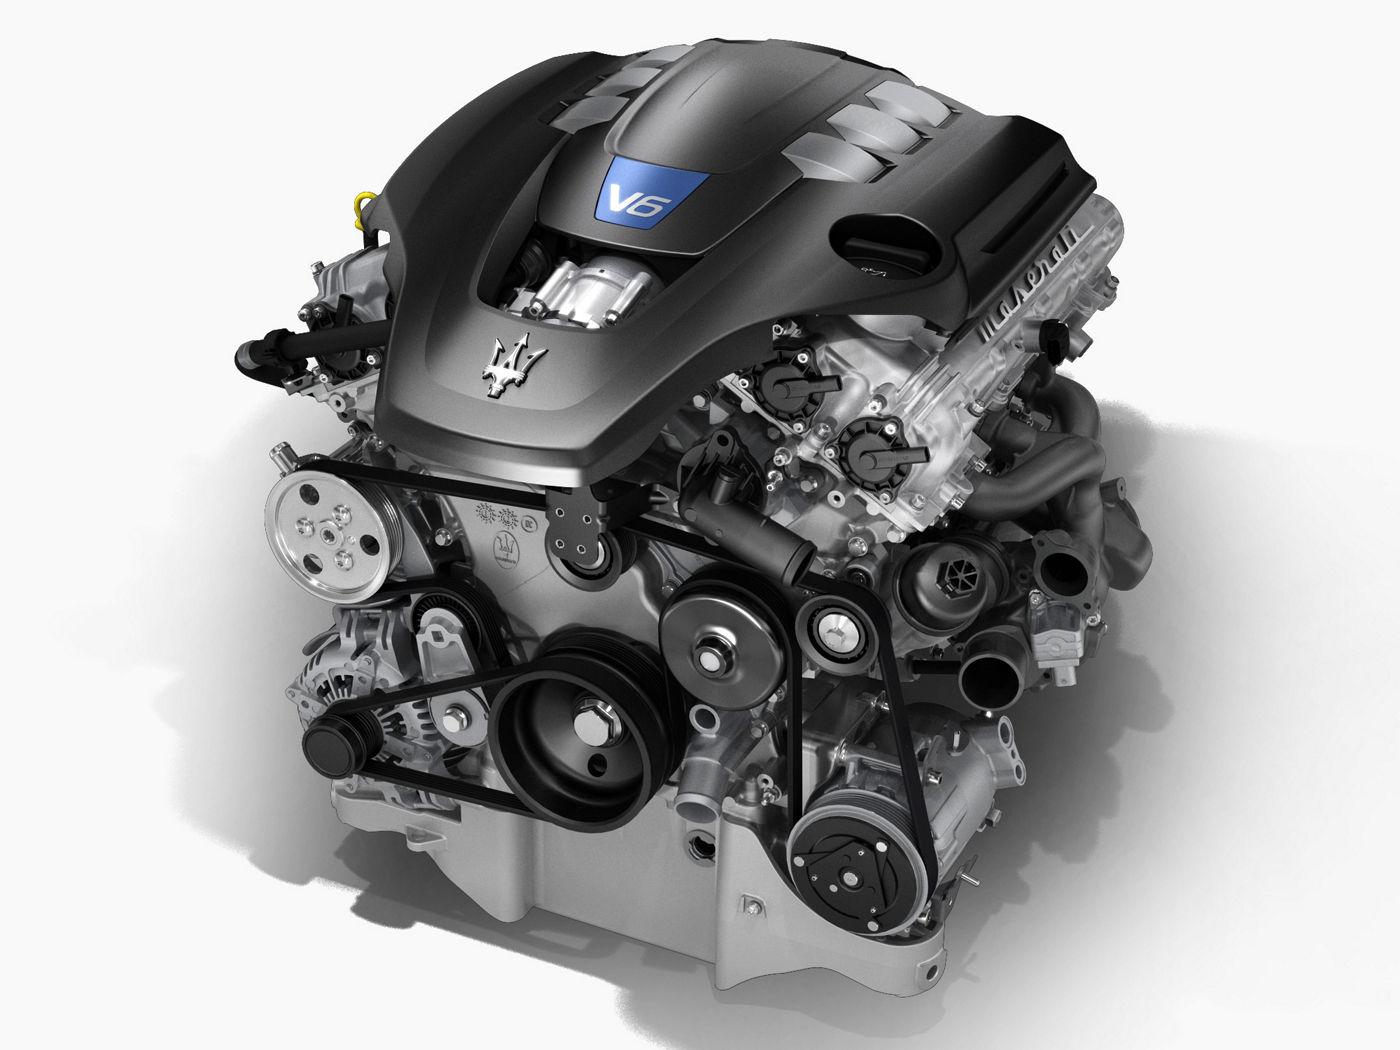 The all Italian Maserati Quattroporte V6 Engine: horsepower, cc and structure